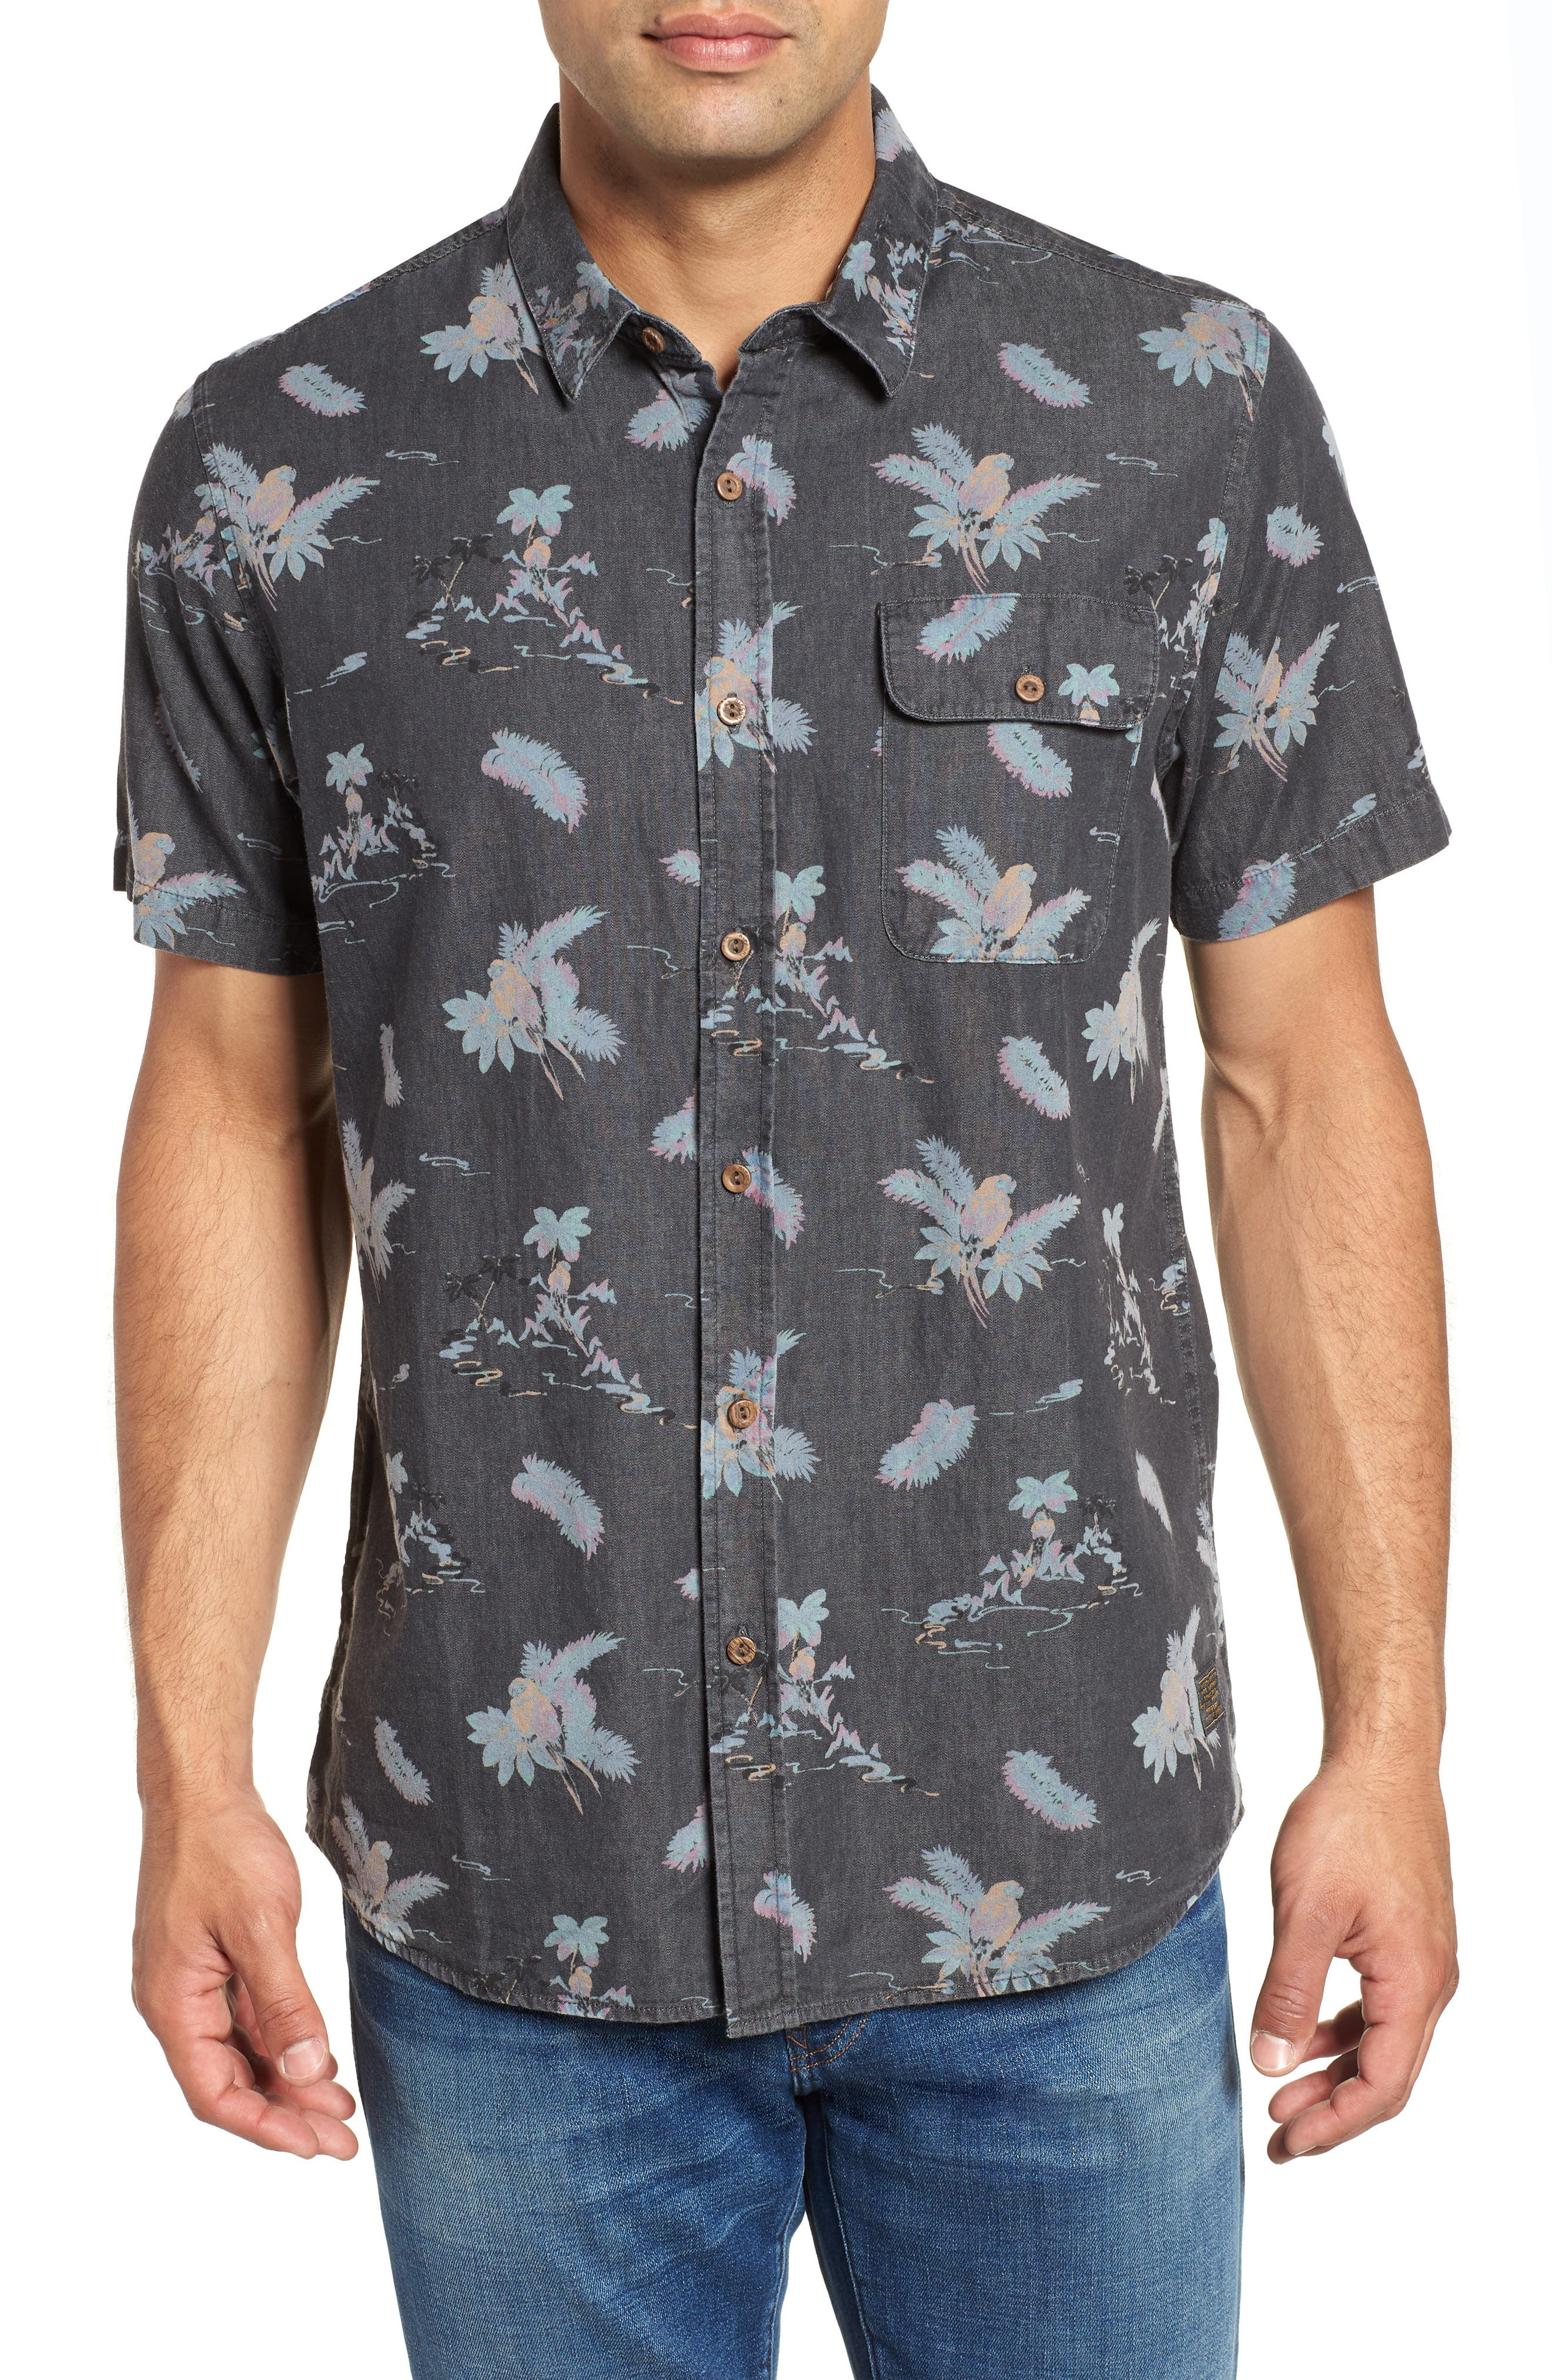 Meledrone Woven Shirt,                         Main,                         color,